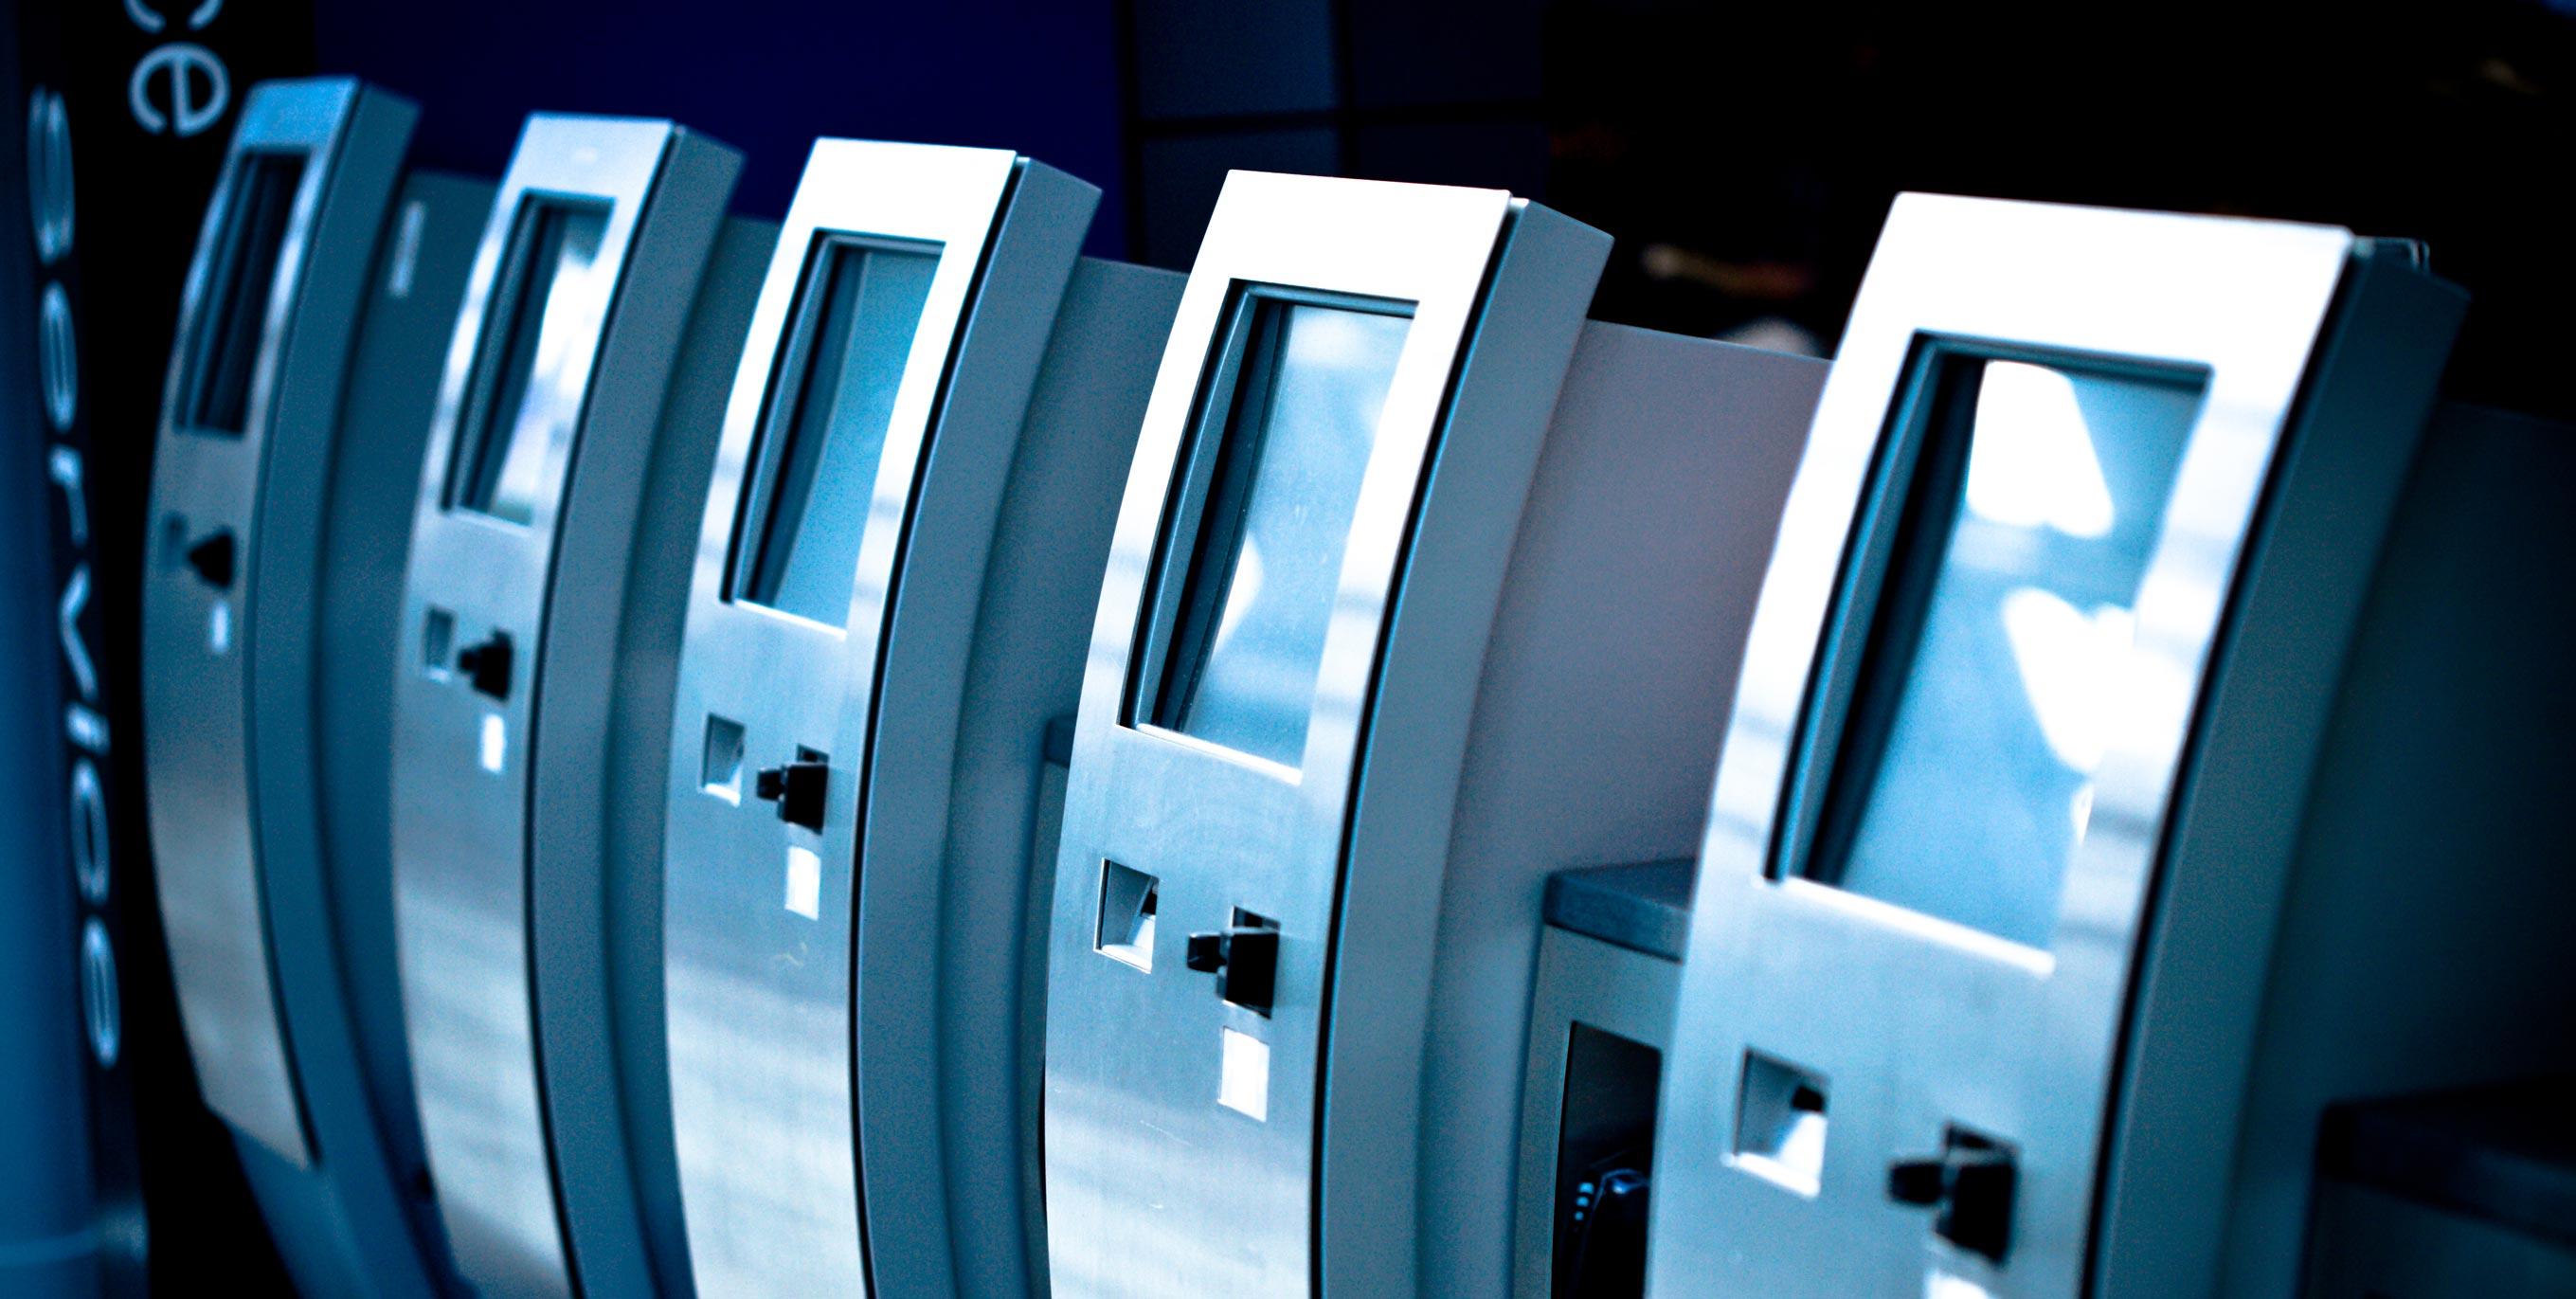 Payment Systems Pos & Kiosk K.F.I.